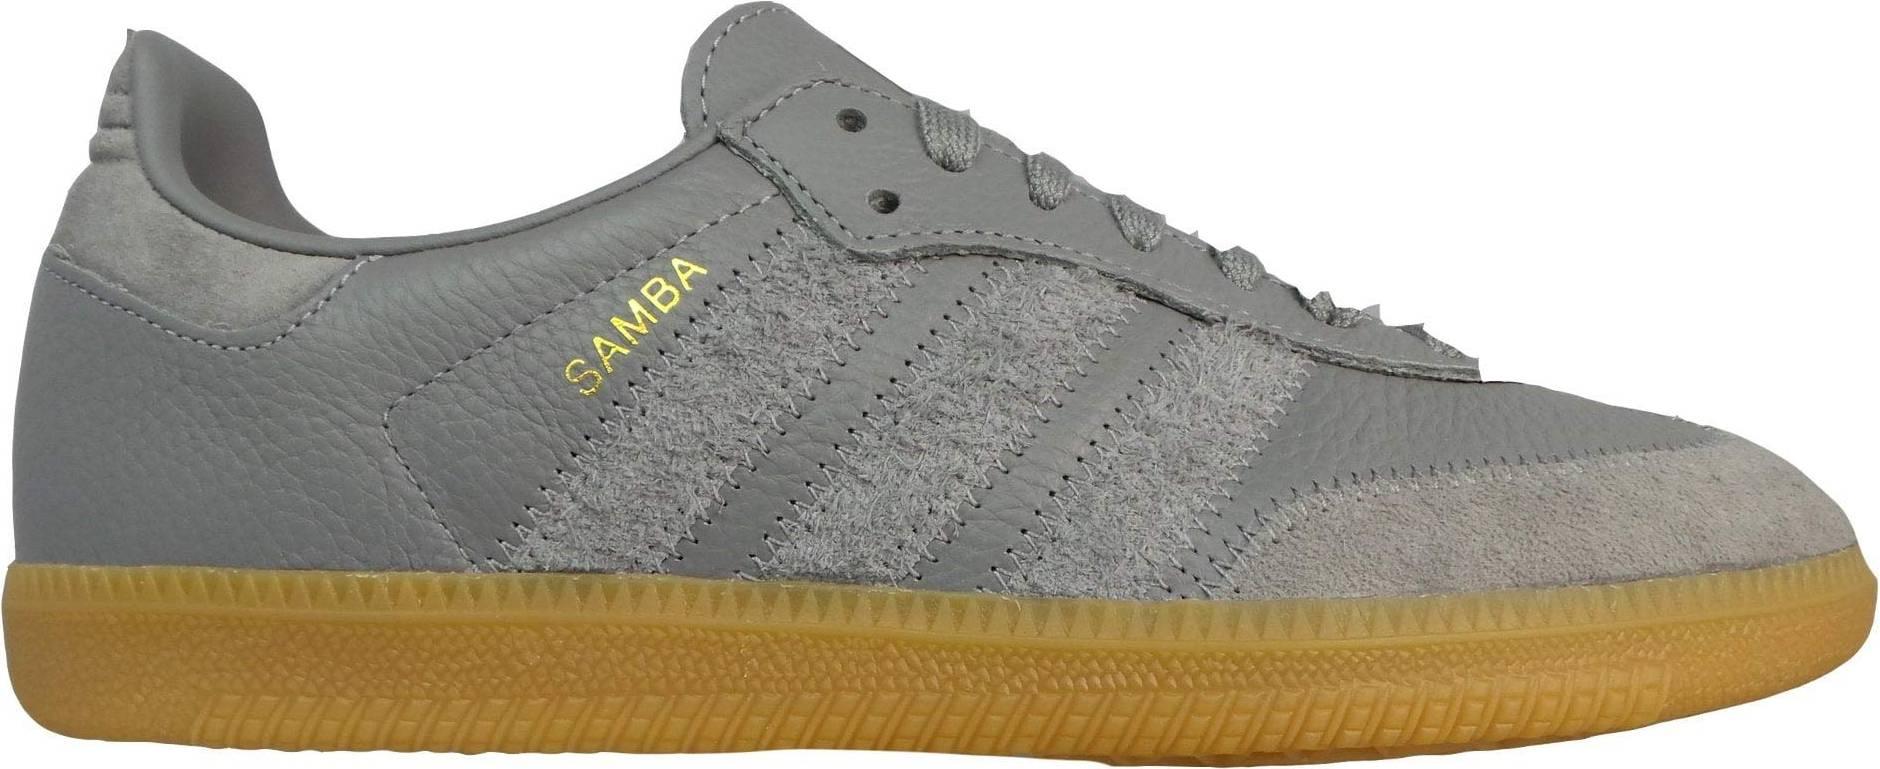 Guante Irradiar apaciguar  8 Reasons to/NOT to Buy Adidas Samba OG FT (Jan 2021) | RunRepeat